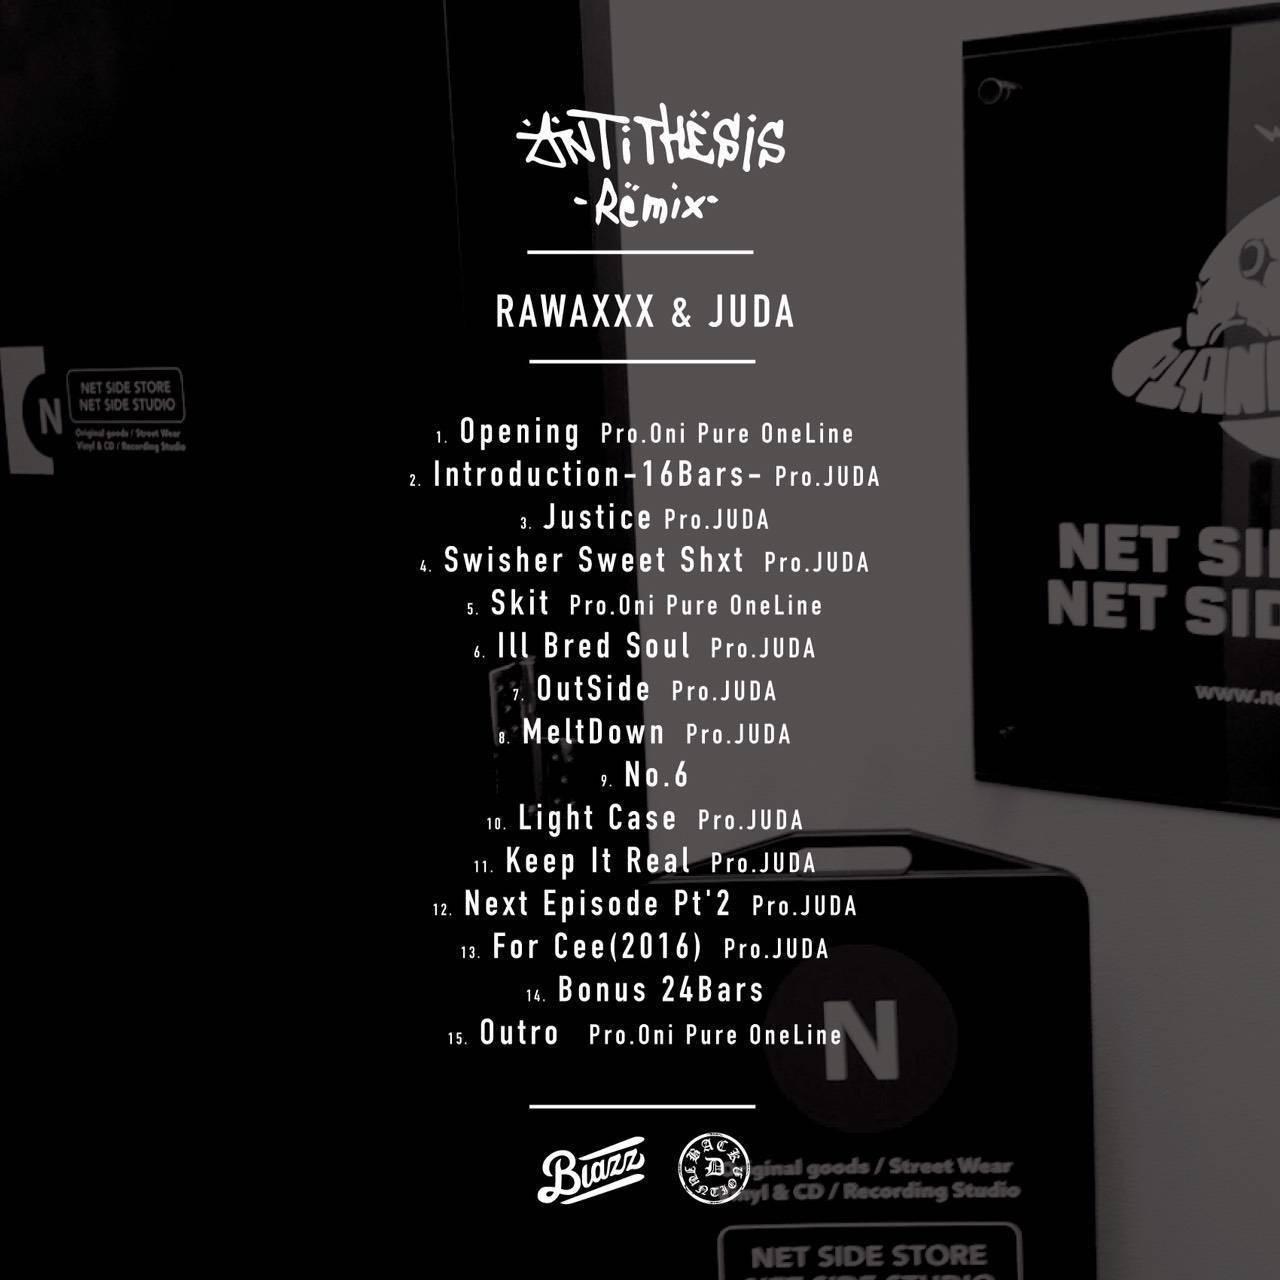 【CD】ANTITHESIS -Remix- / RAWAXXX & Juda